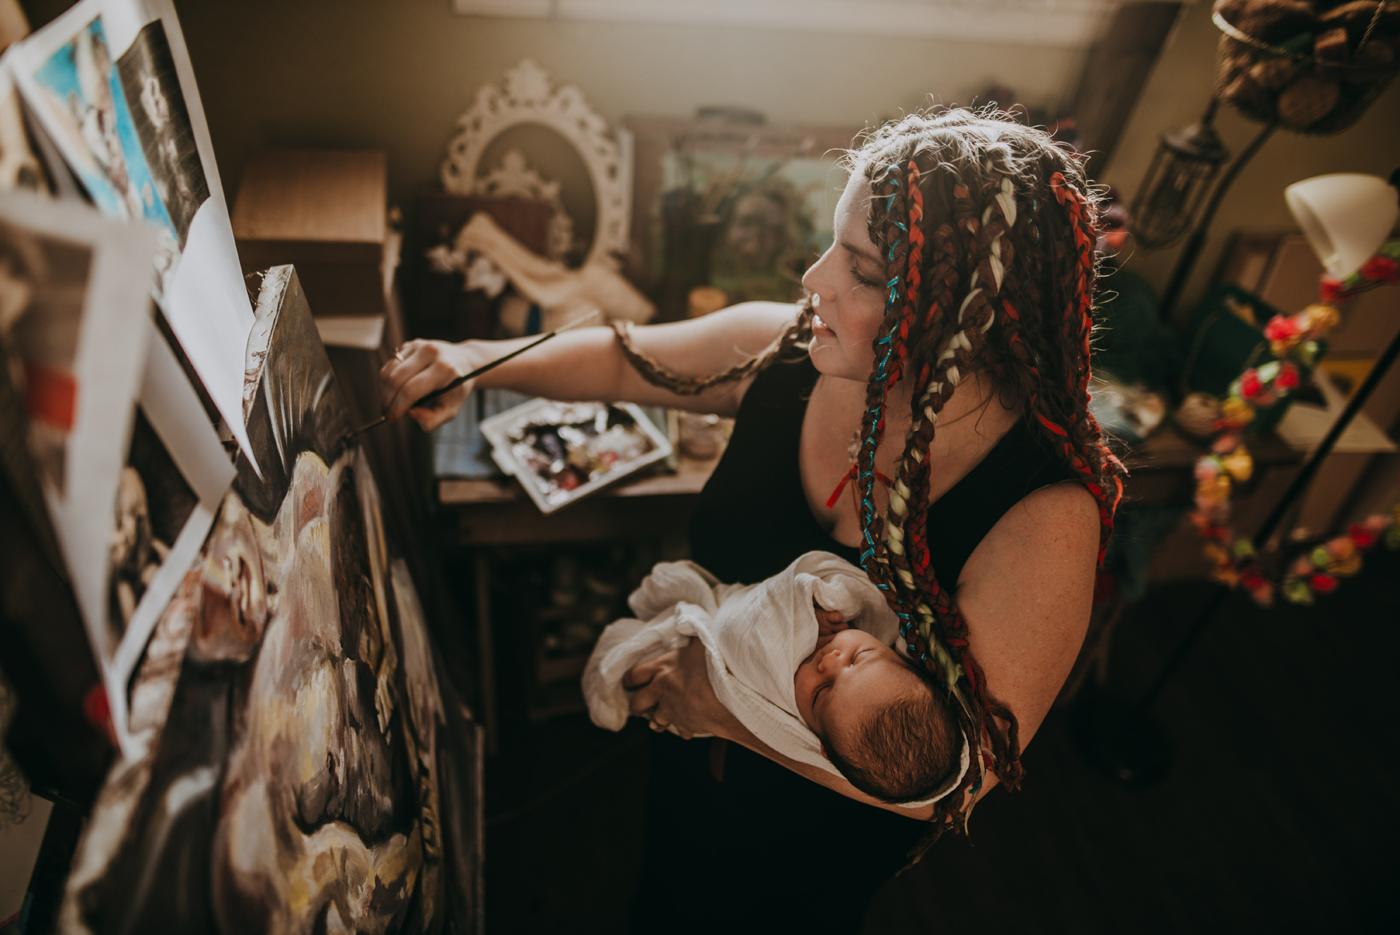 JensenL-ArtMotherhood-Womanhood